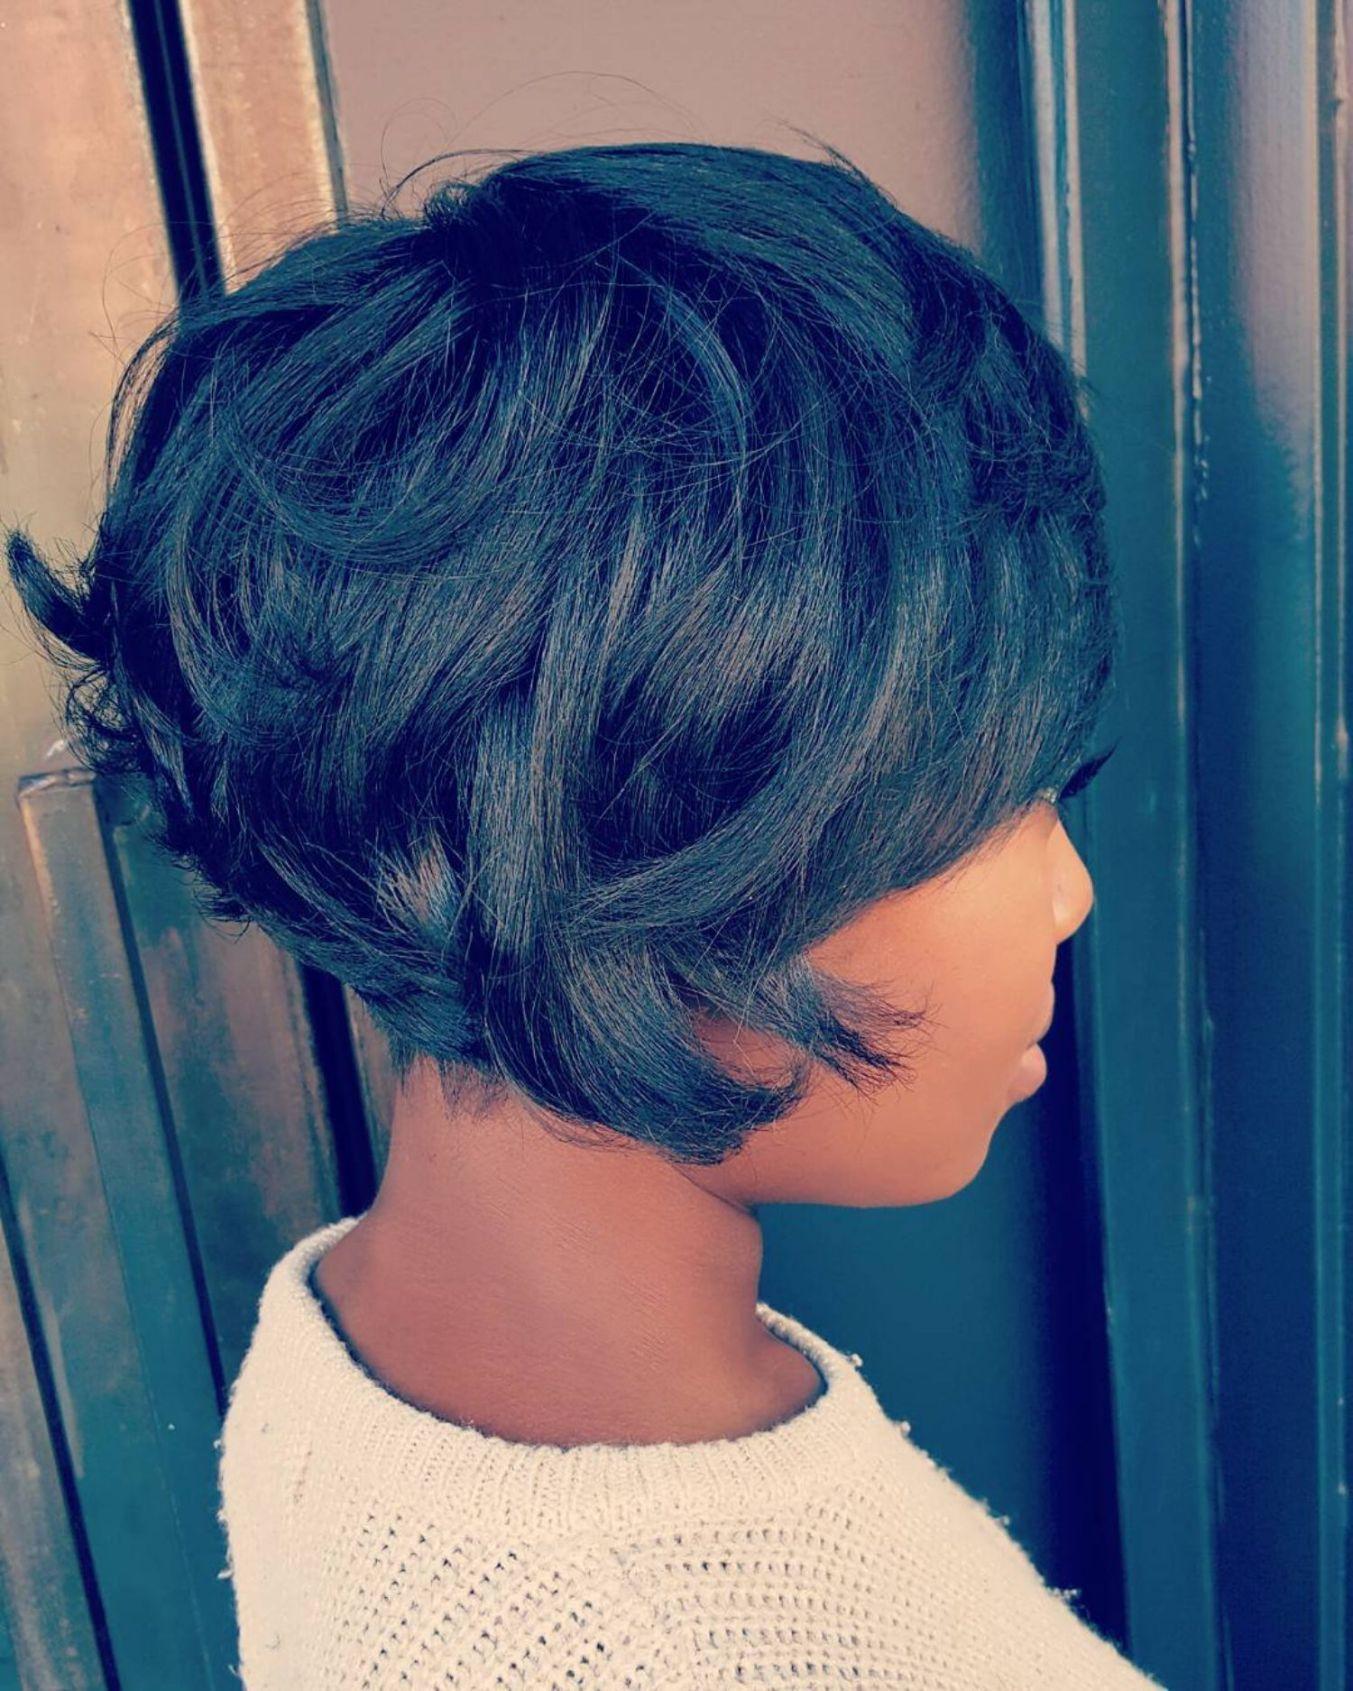 60 Showiest Bob Haircuts for Black Women in 2020 | Choppy ...